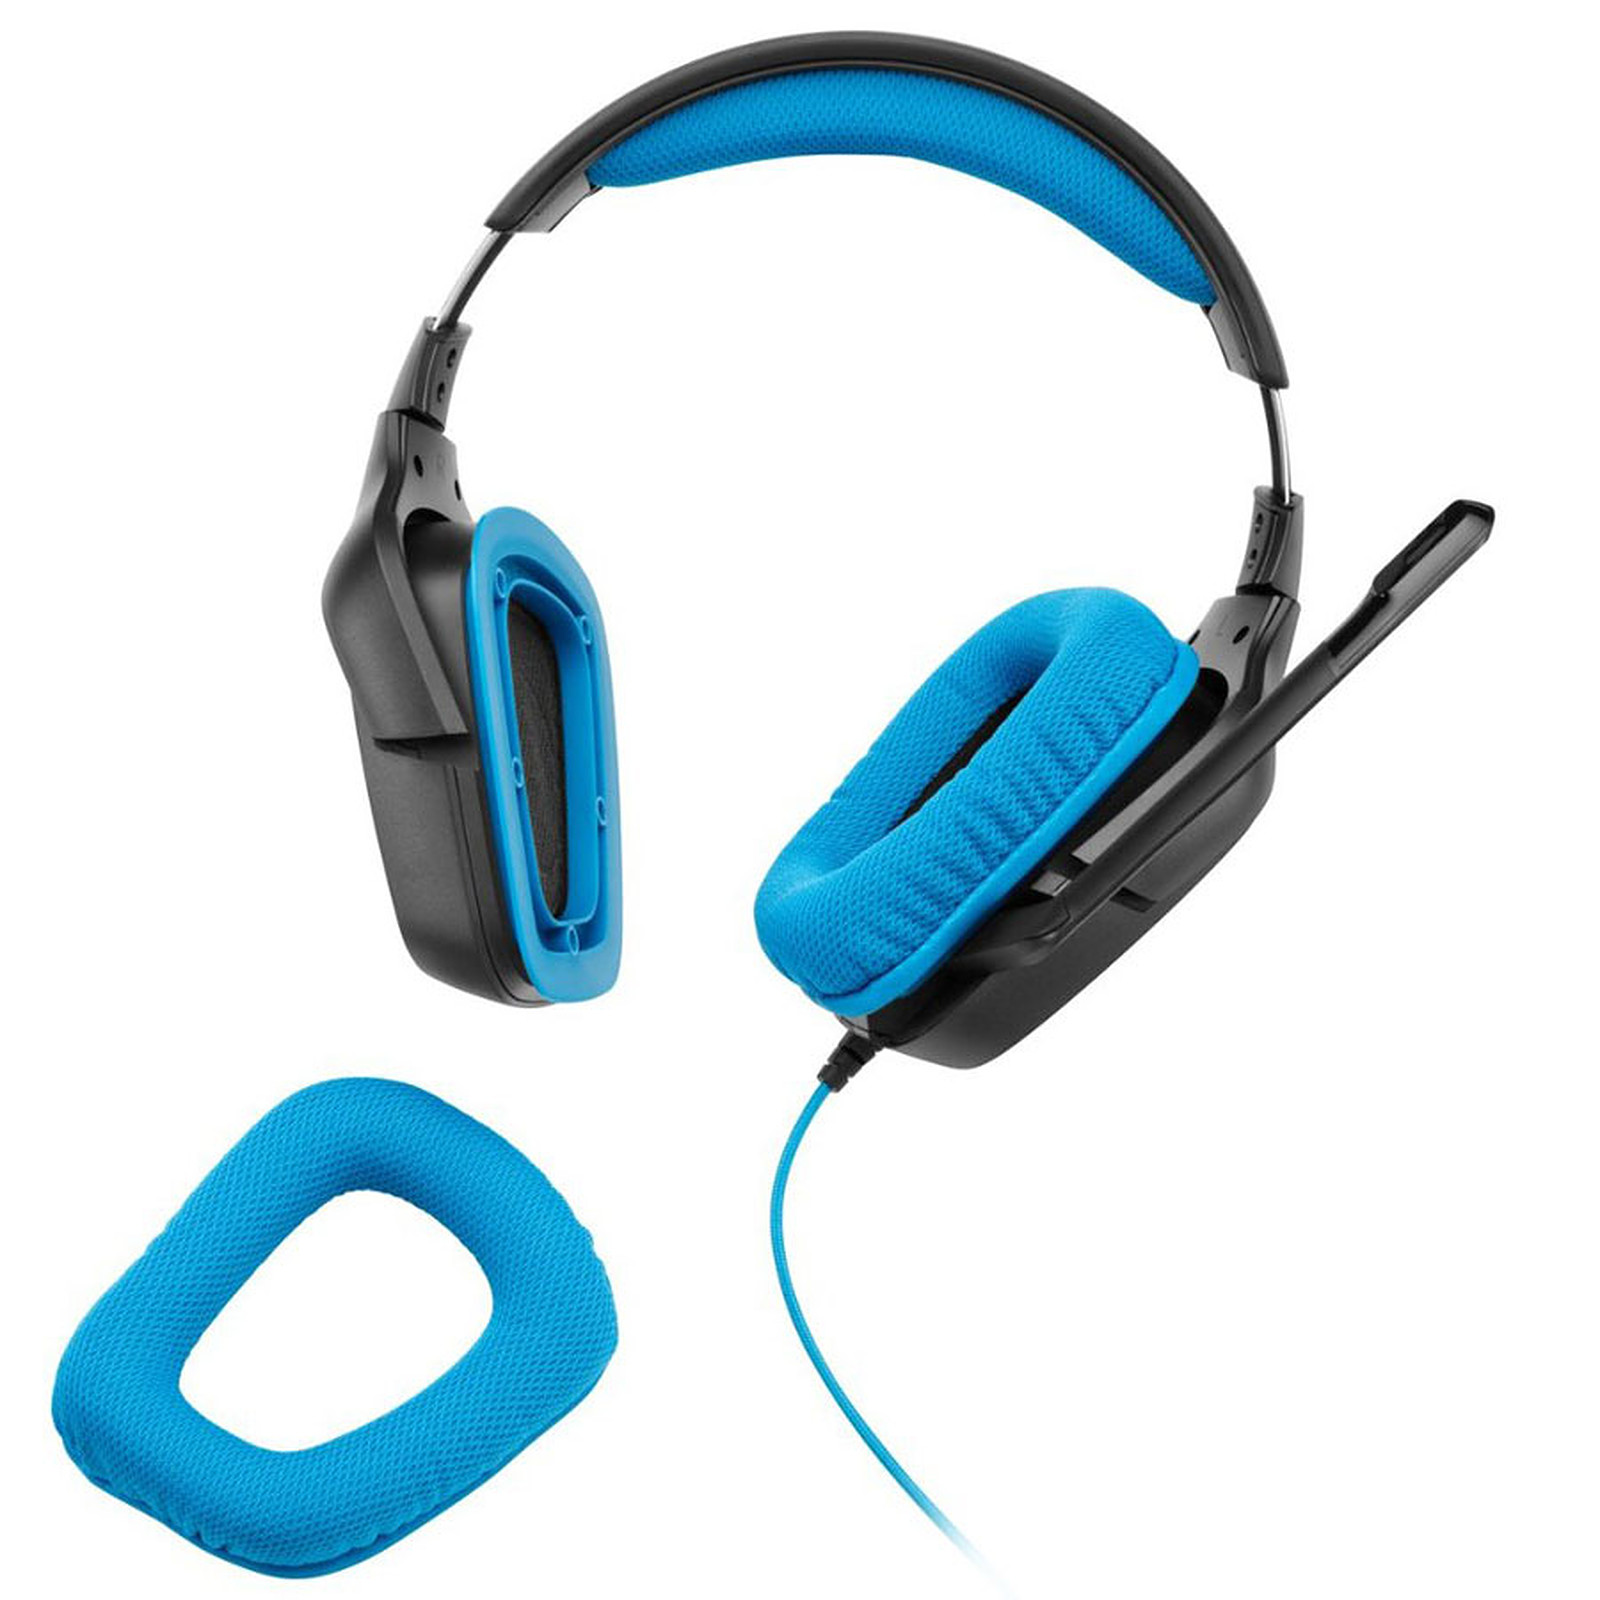 casque audio logitech g430